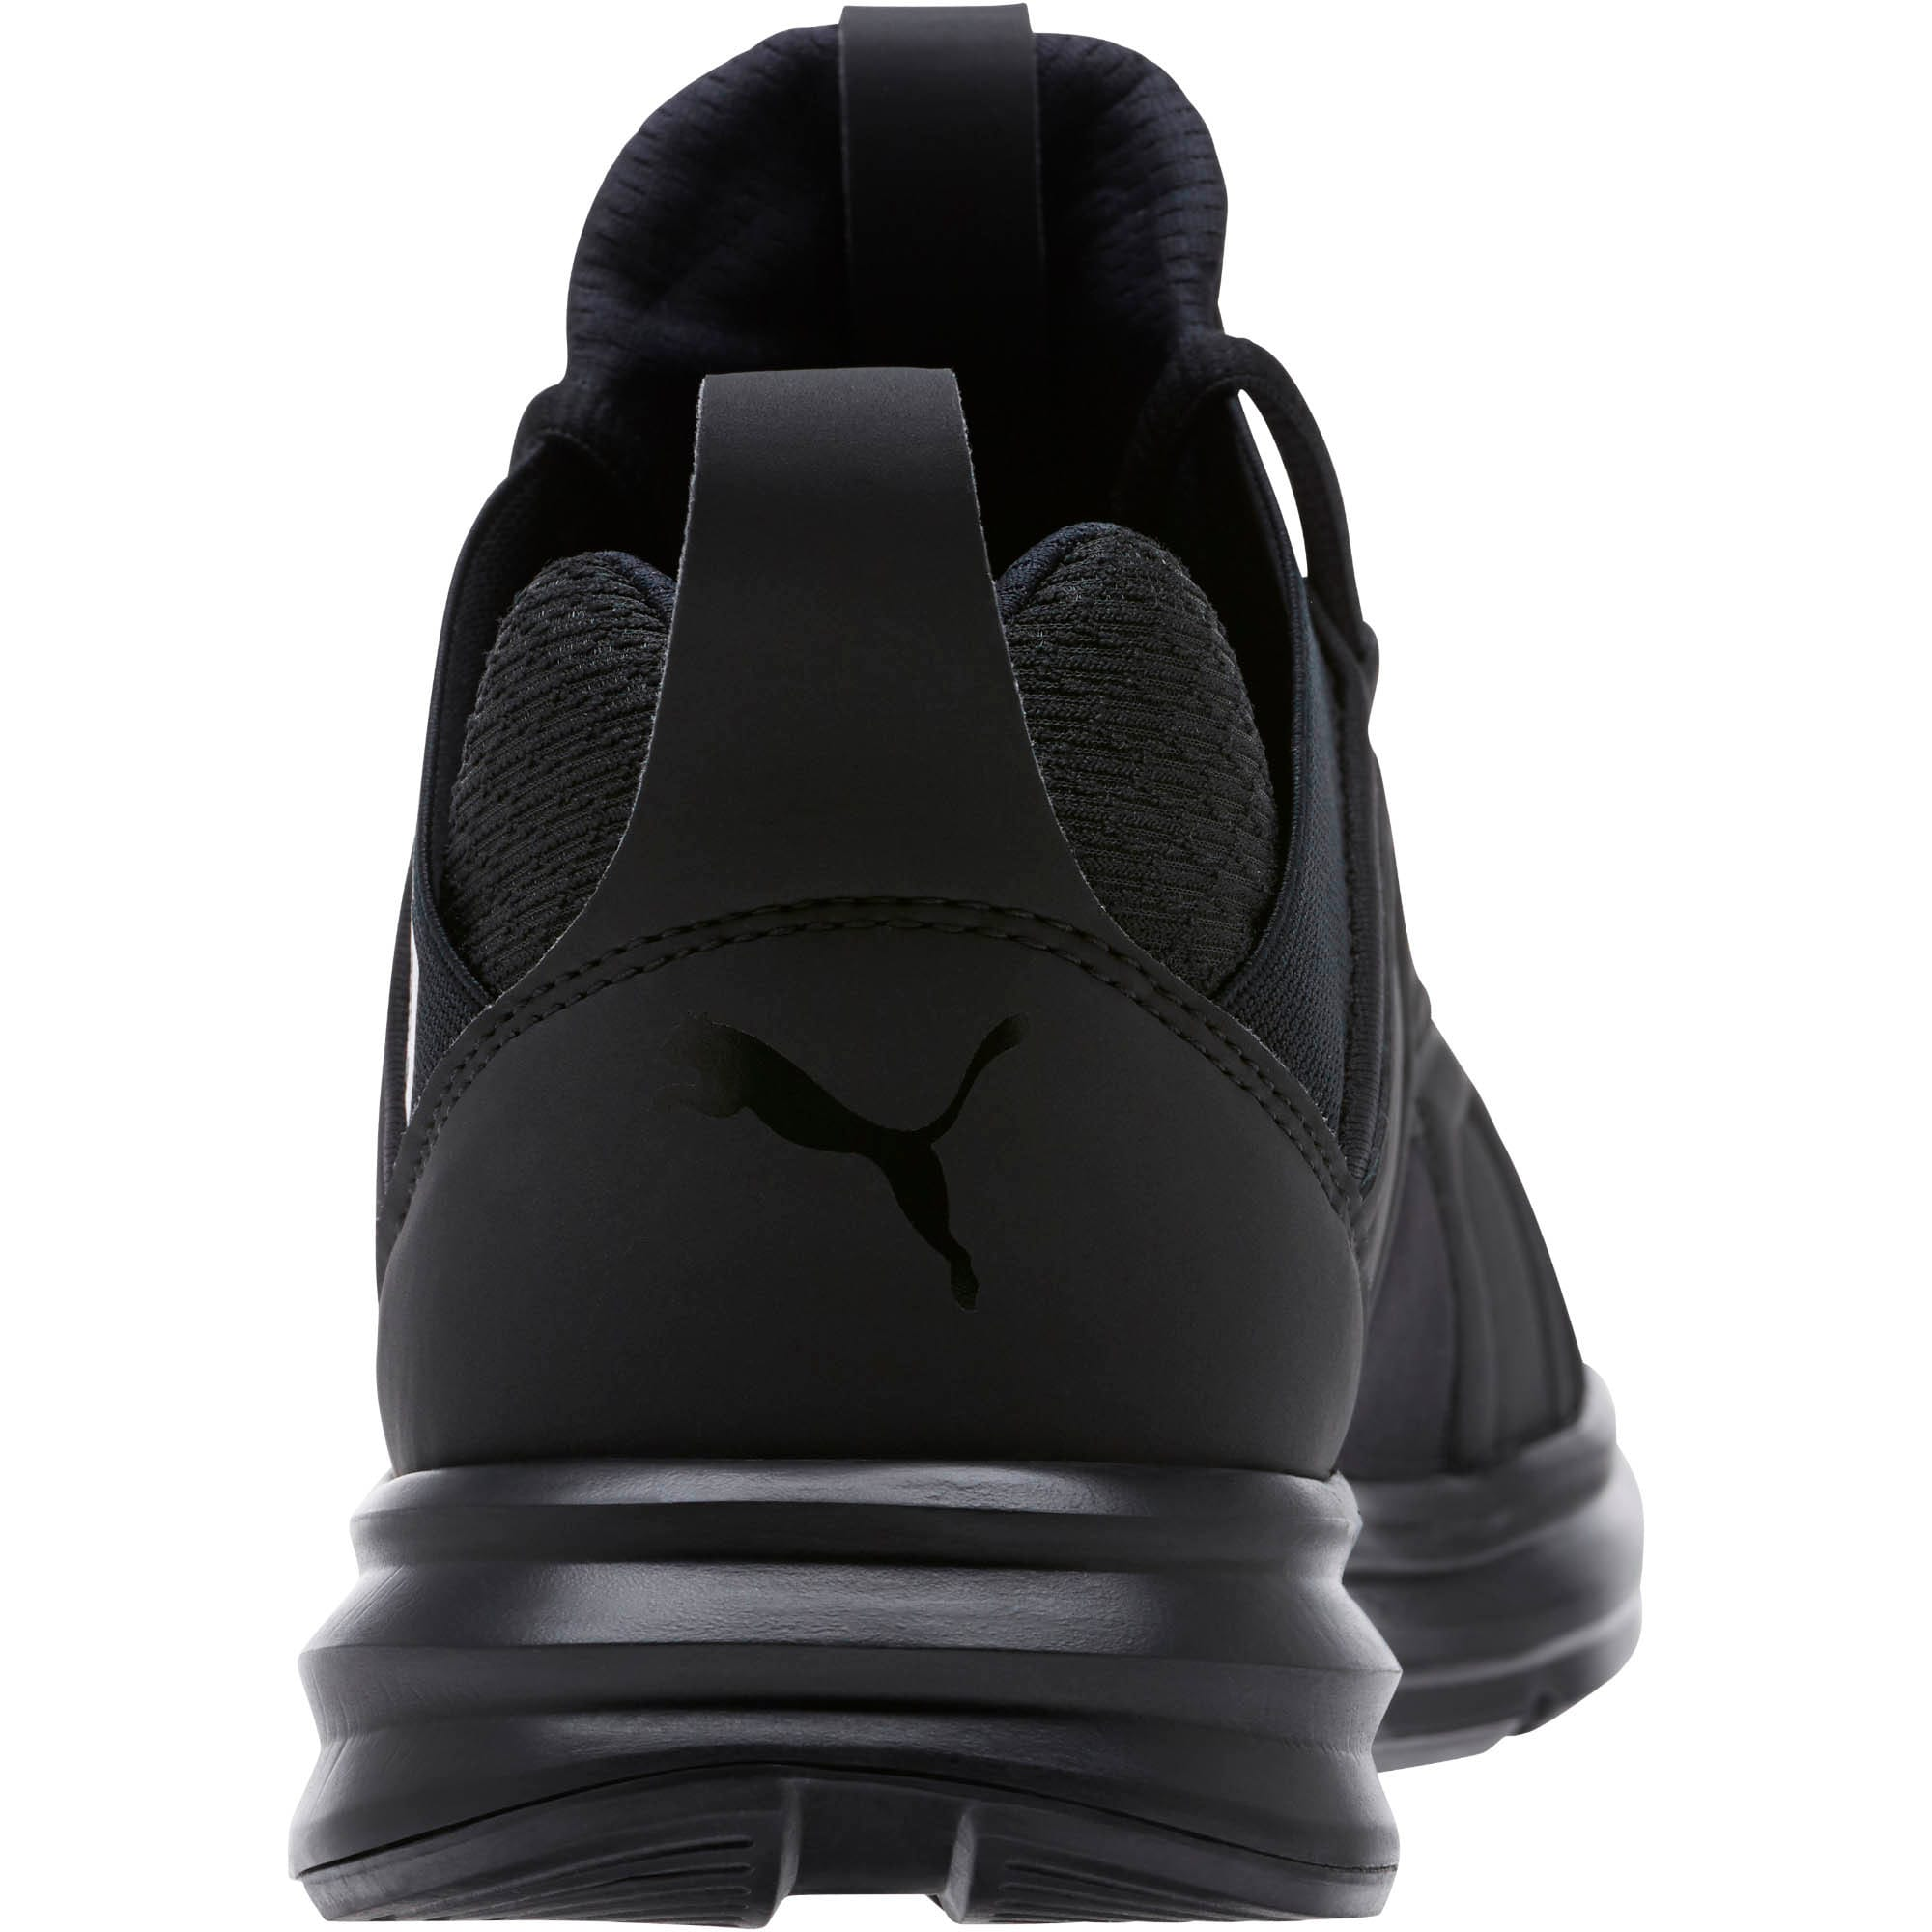 Thumbnail 4 of Zenvo Women's Training Shoes, Puma Black-Puma Black, medium